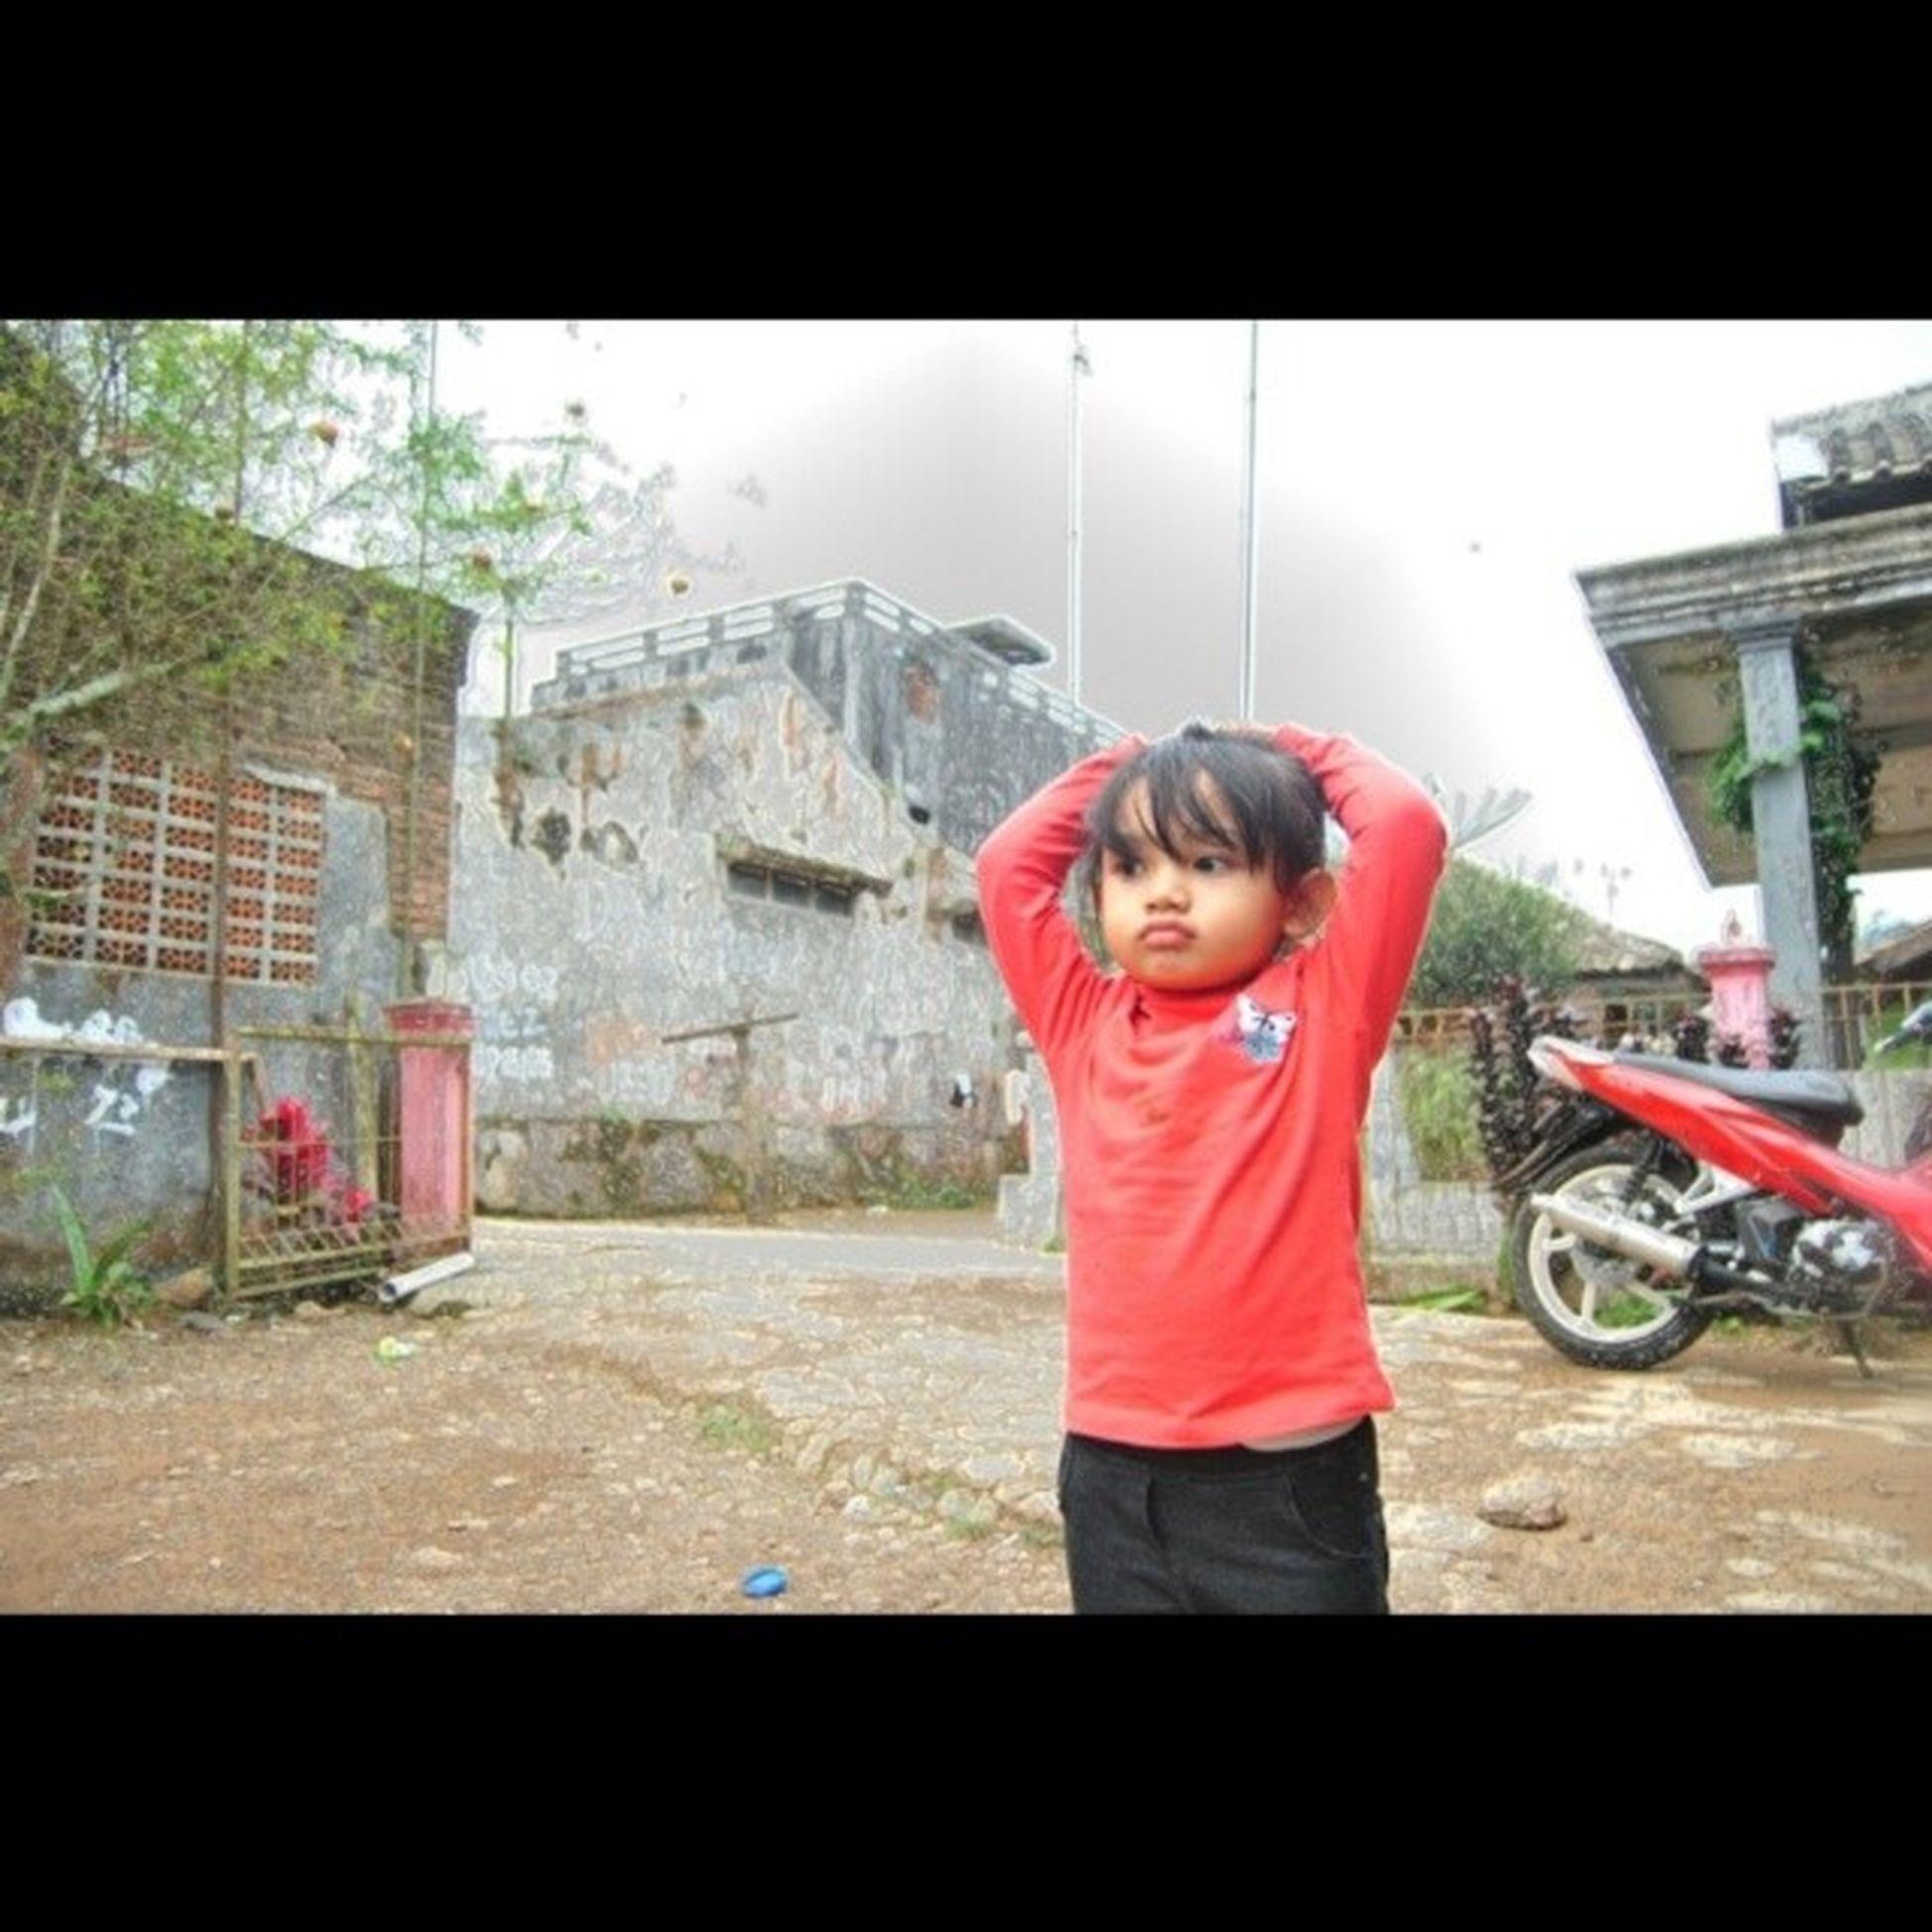 Alsya Nofilter Noeffect Originalpict redblack pict2